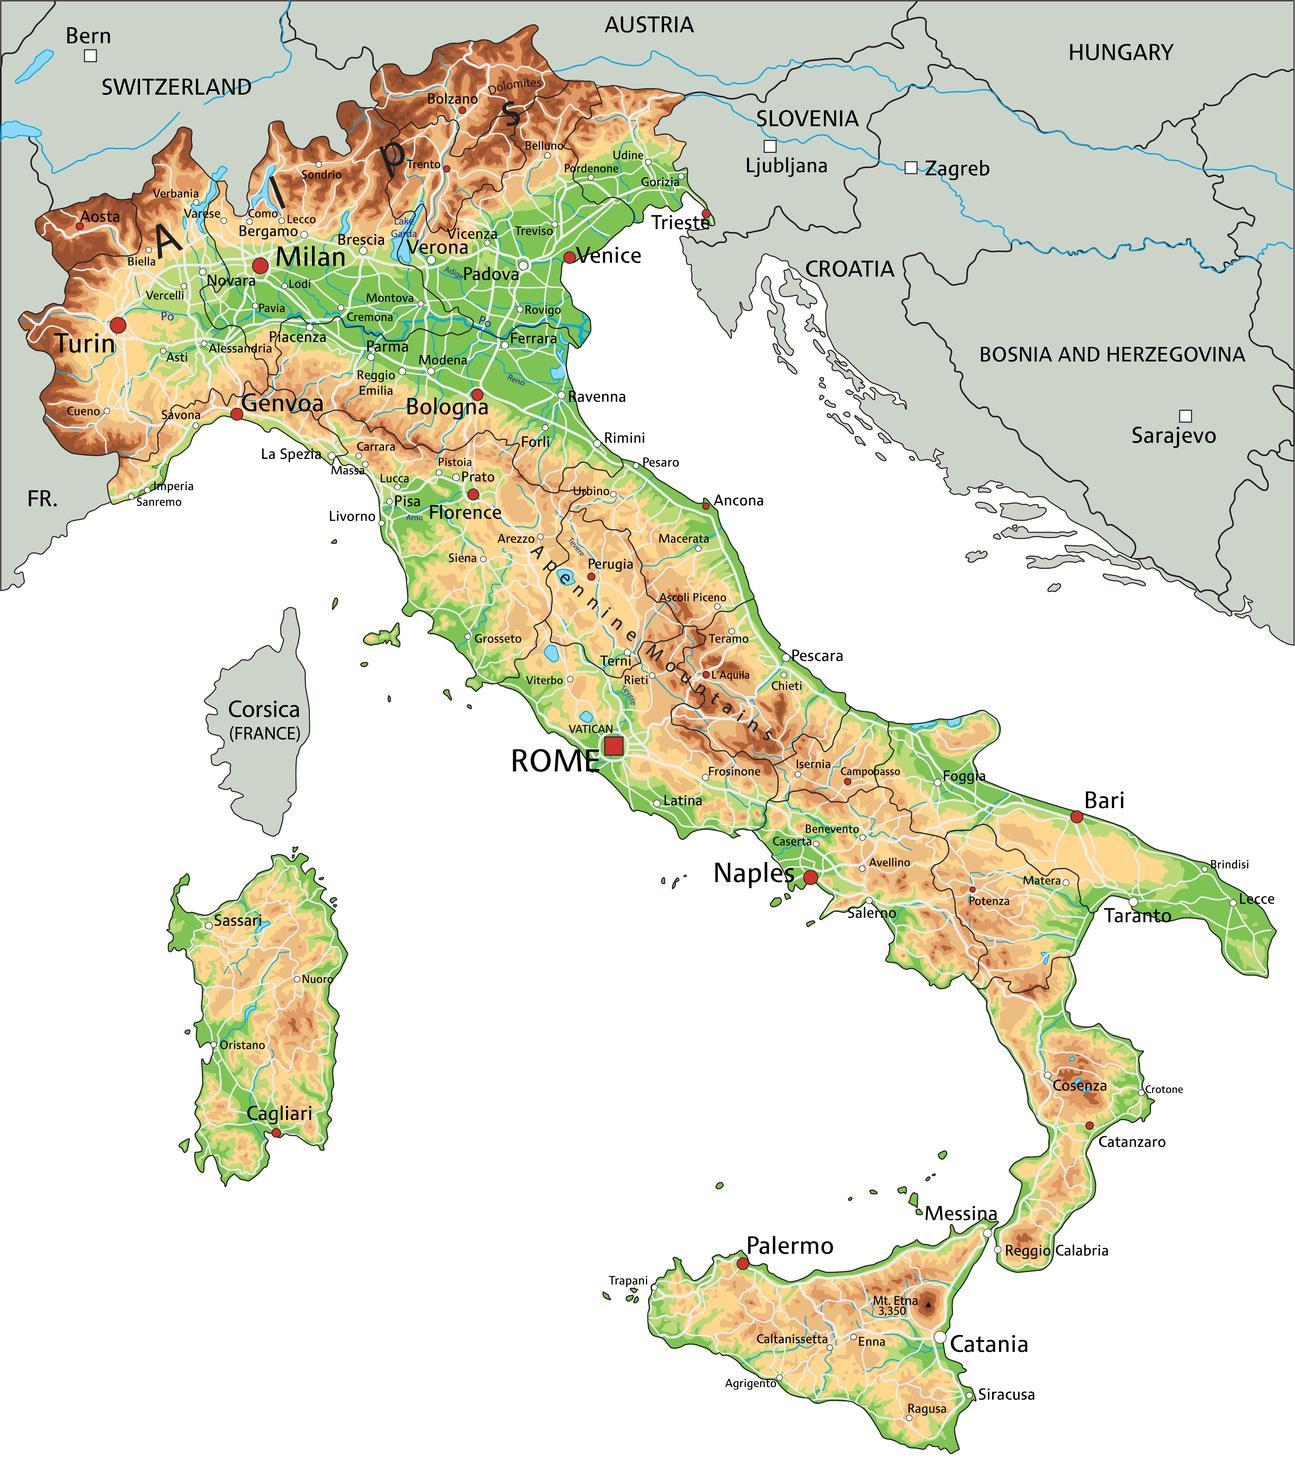 Rom Napoli Kort Kort Rom Napoli Lazio Italien